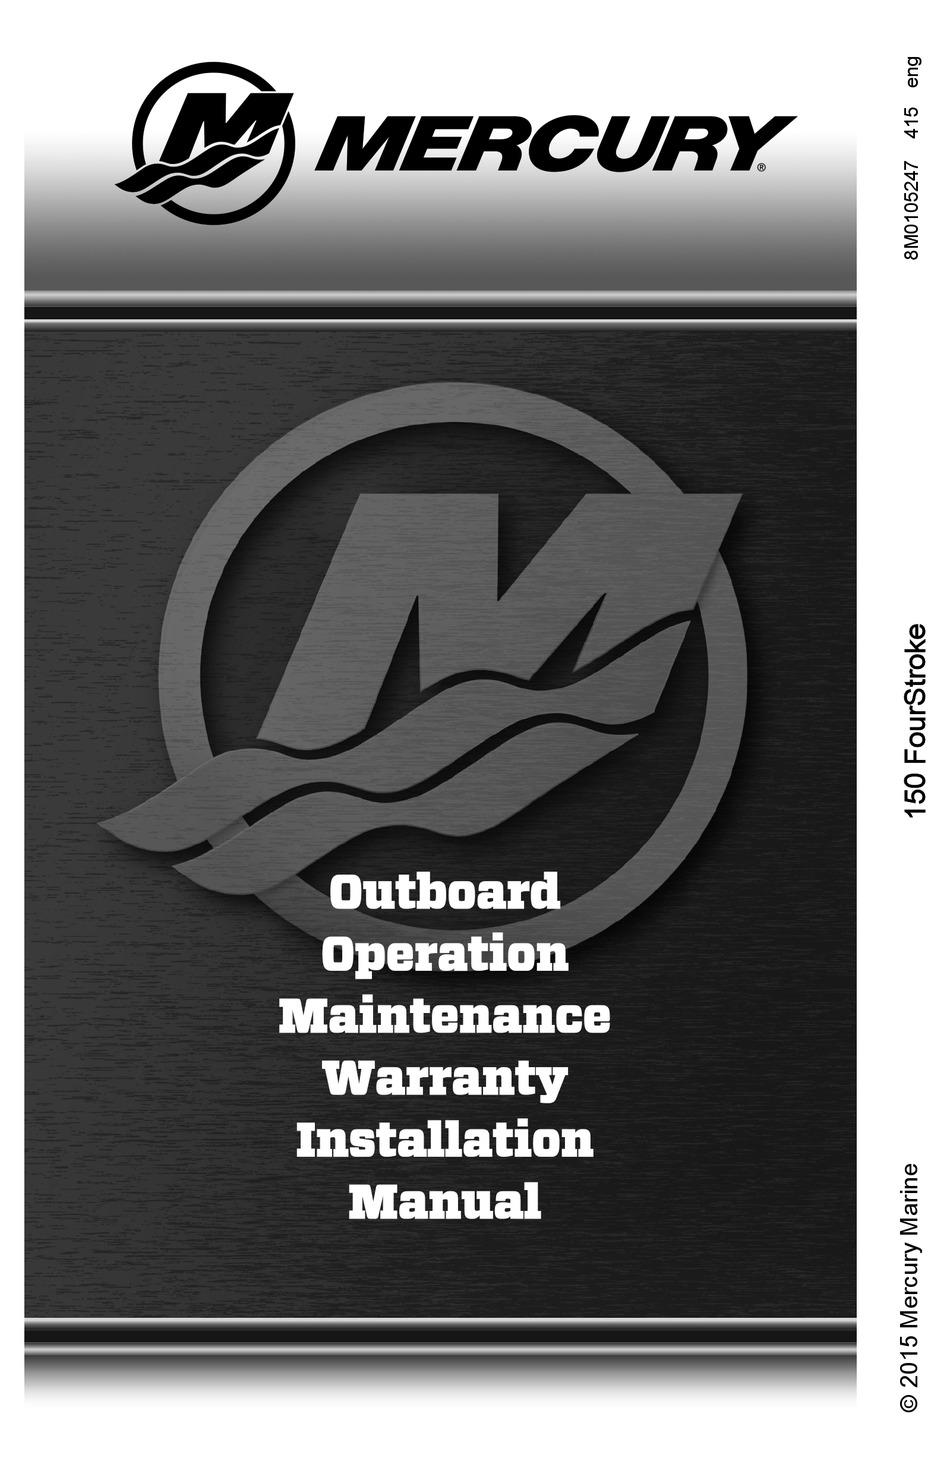 mercury 150 fourstroke operation & installation manual pdf download    manualslib  manualslib